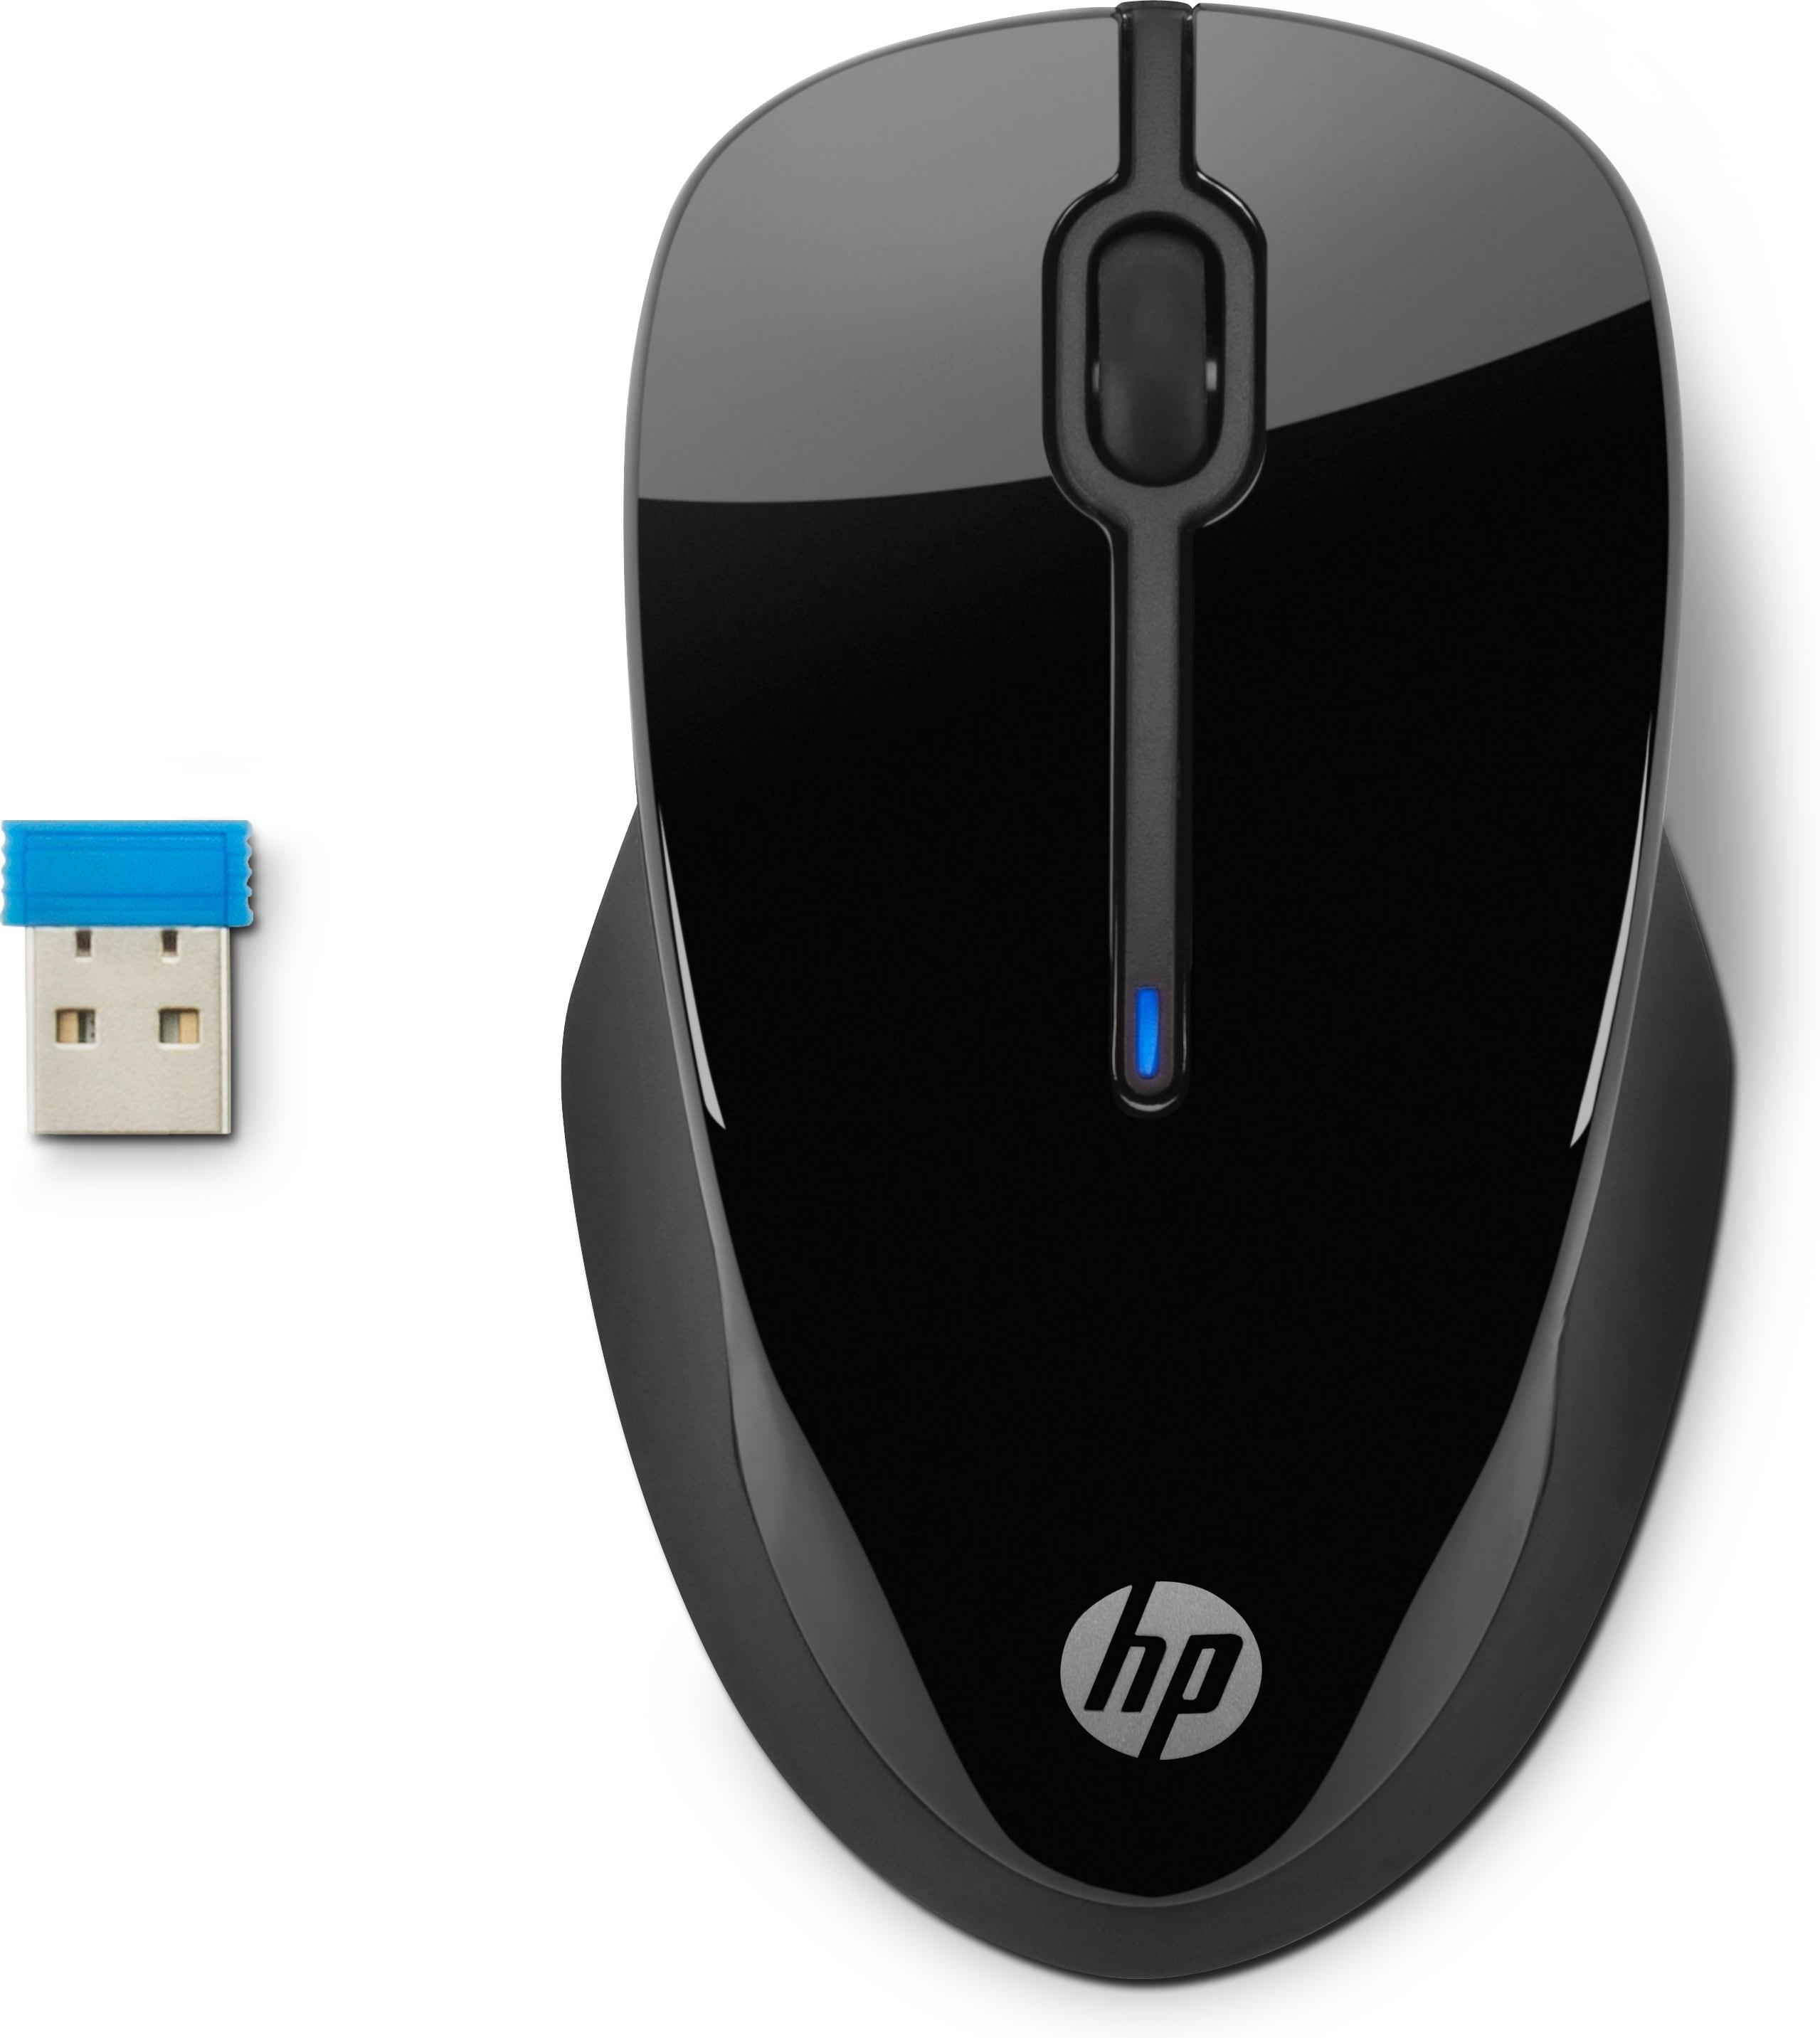 2044510-HP-3FV67AA-mouse-RF-Wireless-Blue-LED-1600-DPI-Ambidestro-Wireless-Mous